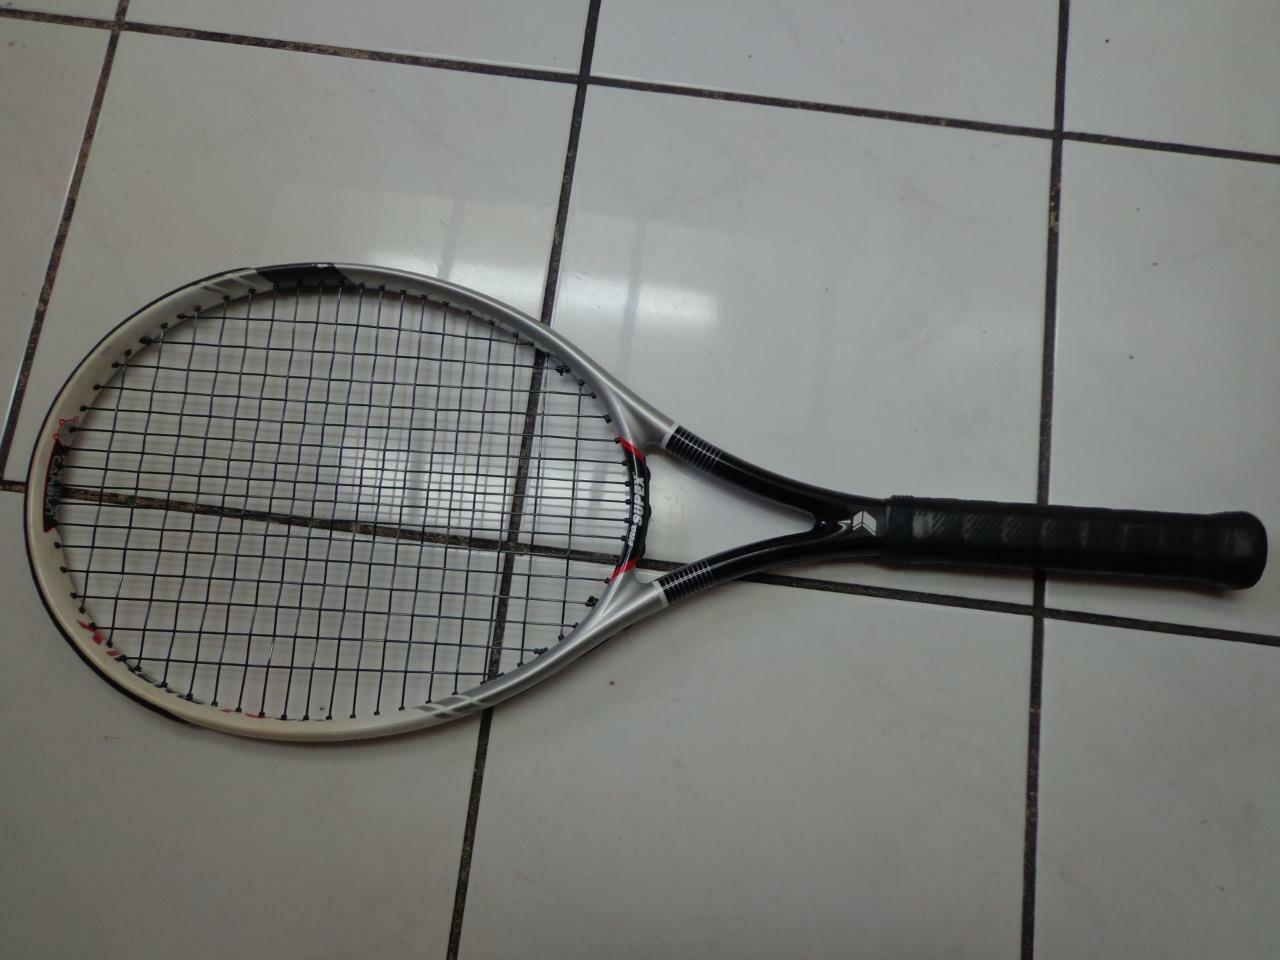 Pro Supex Extreme TOur Aero Drive 100 head 4 3 8 grip Tennis Racquet